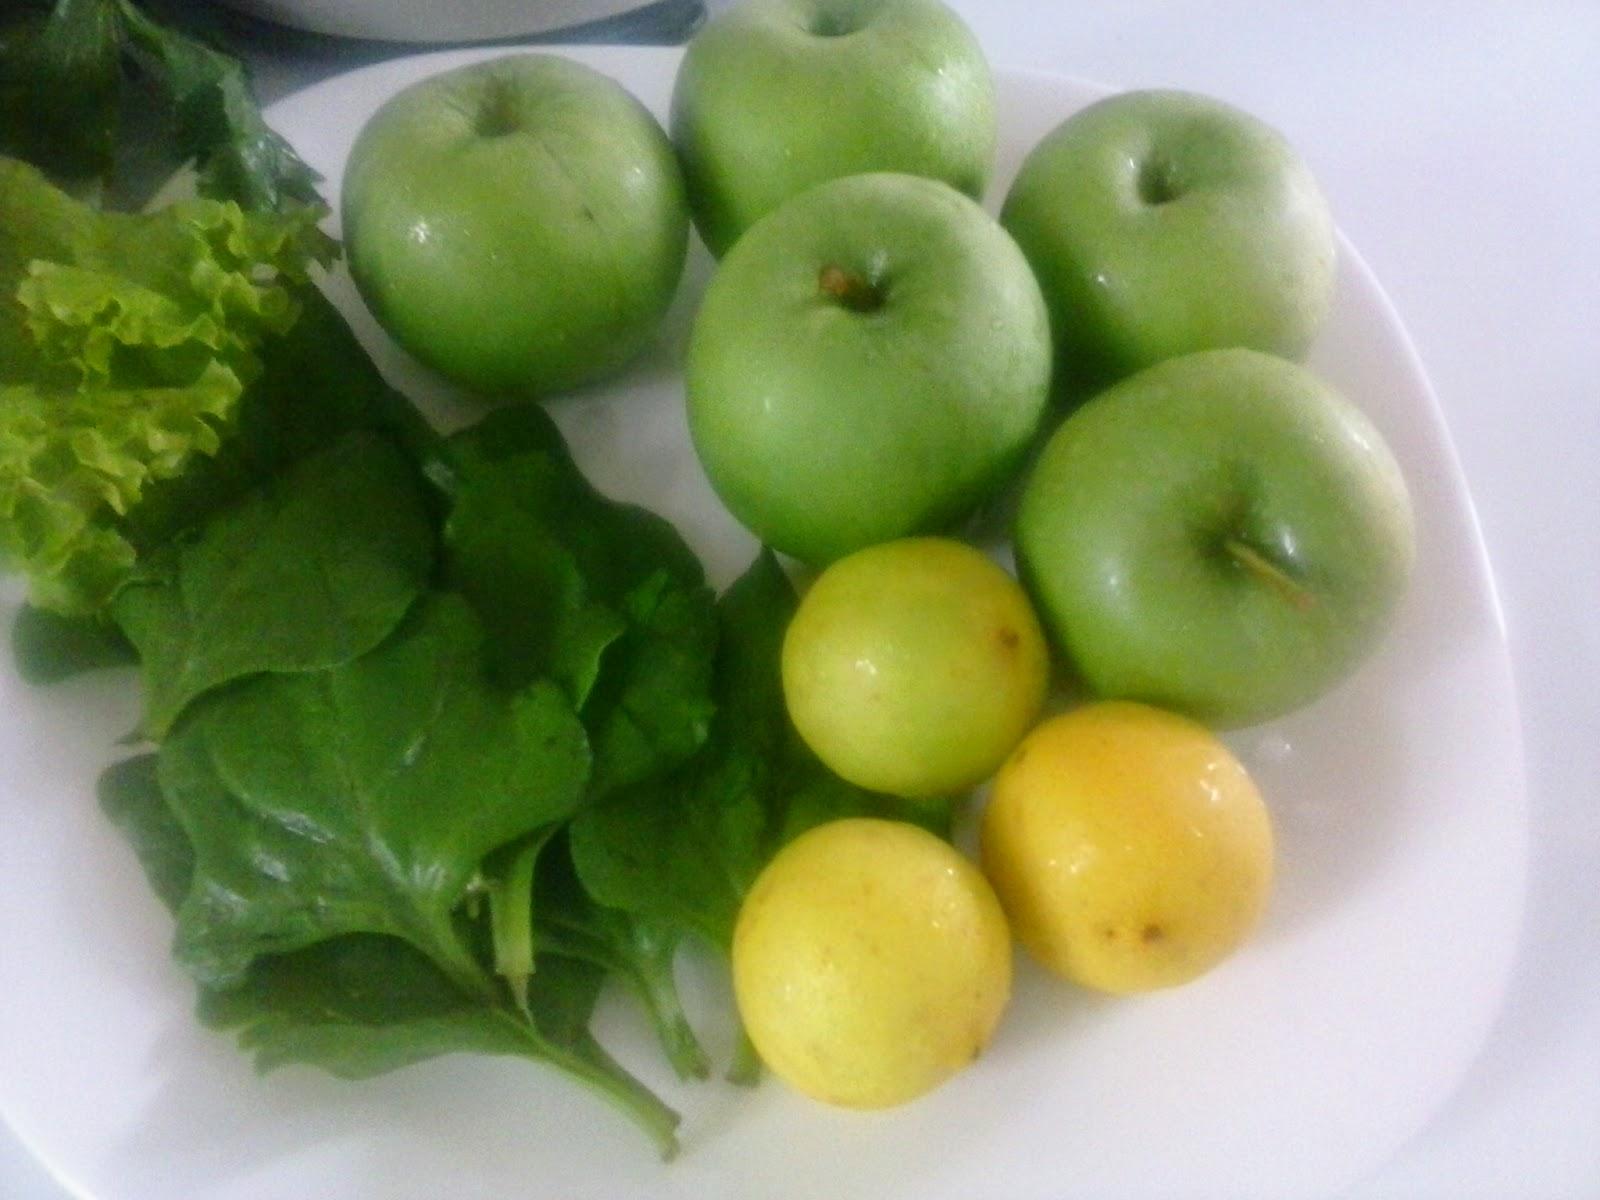 dieta hiperproteica para adelgazar menu